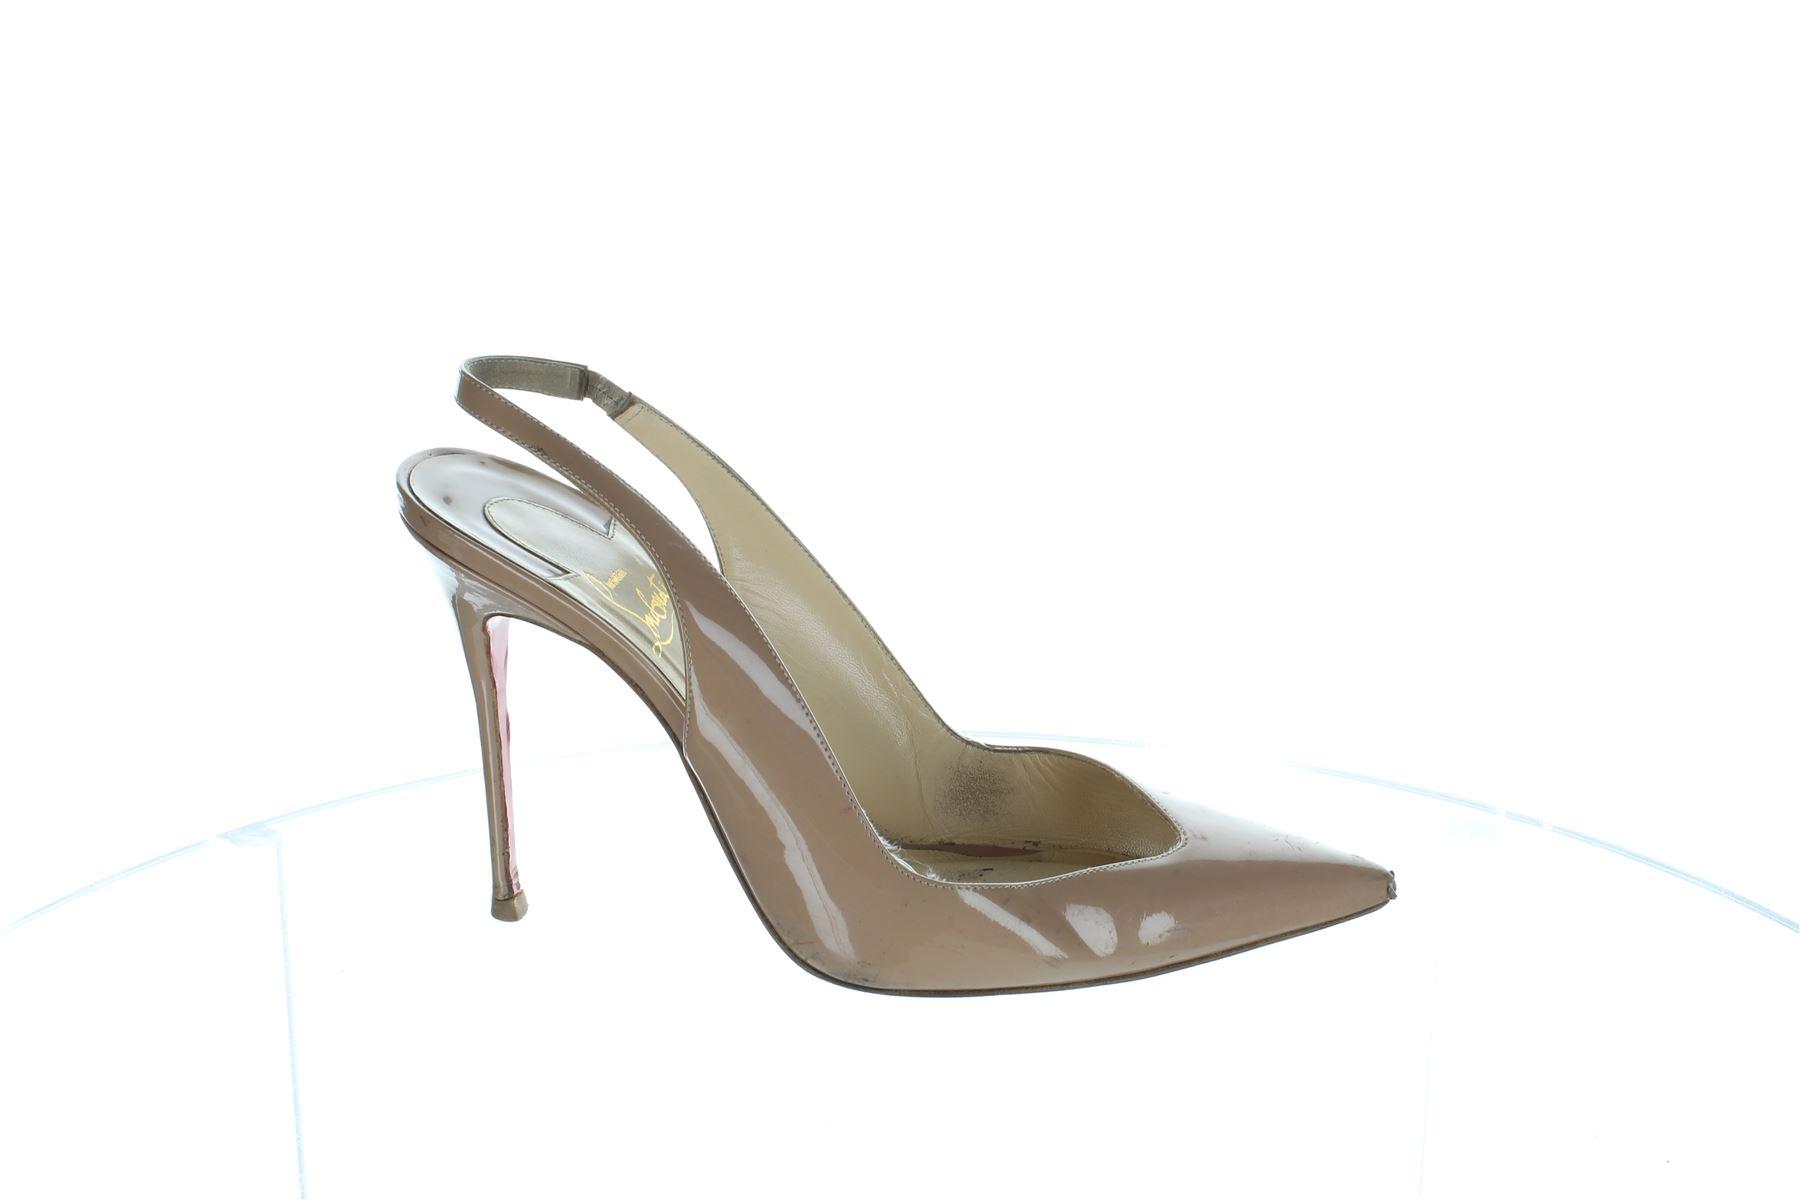 5ab9059aa ... new zealand christian louboutin flueve beige patent leather heels pumps  uk 7 us 10 eu 40